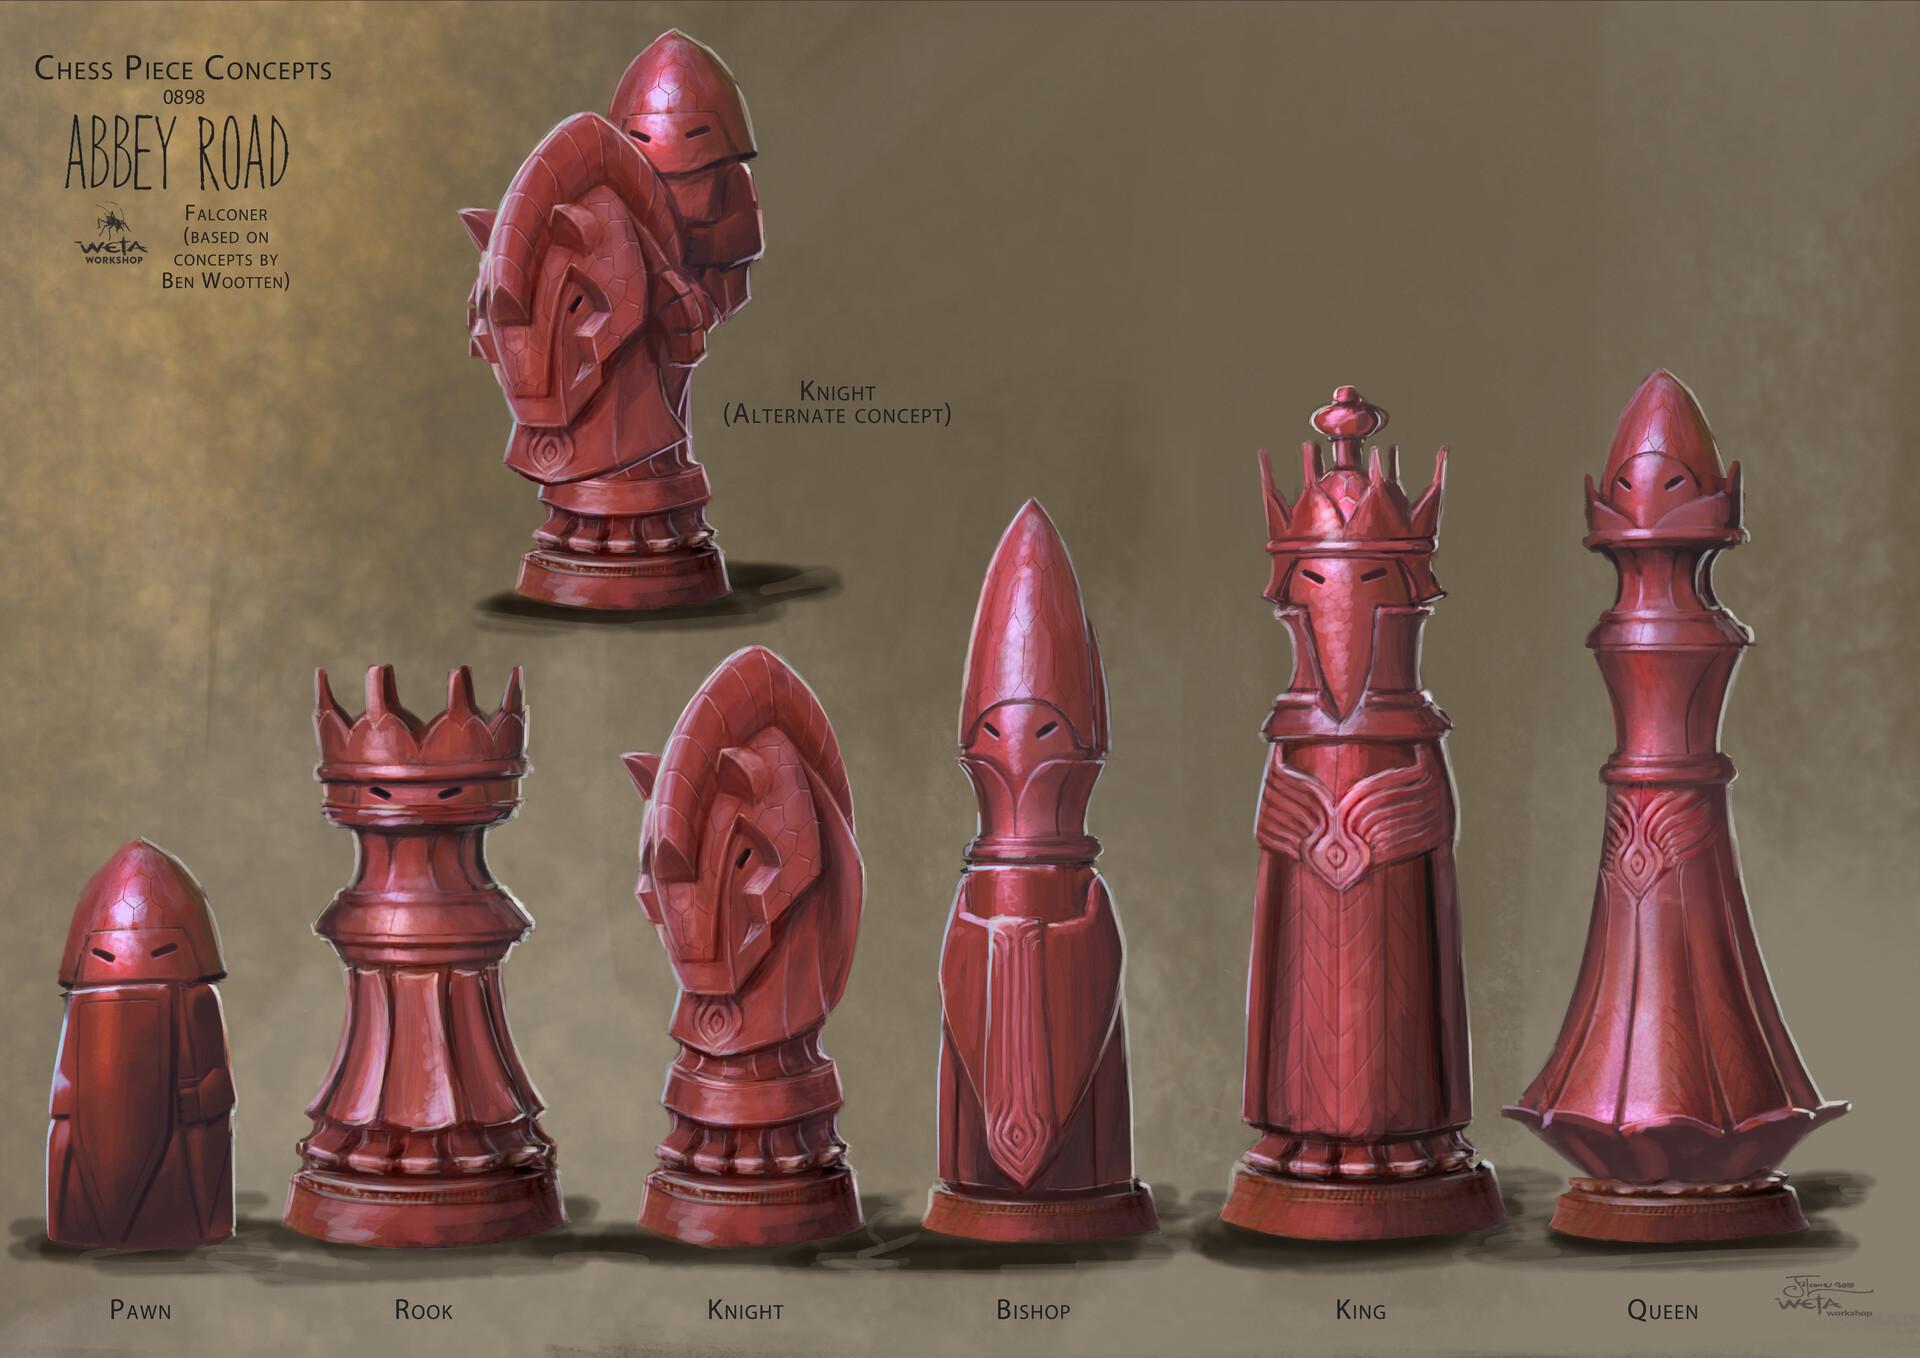 Weta workshop design studio 0898 chessset wet df02